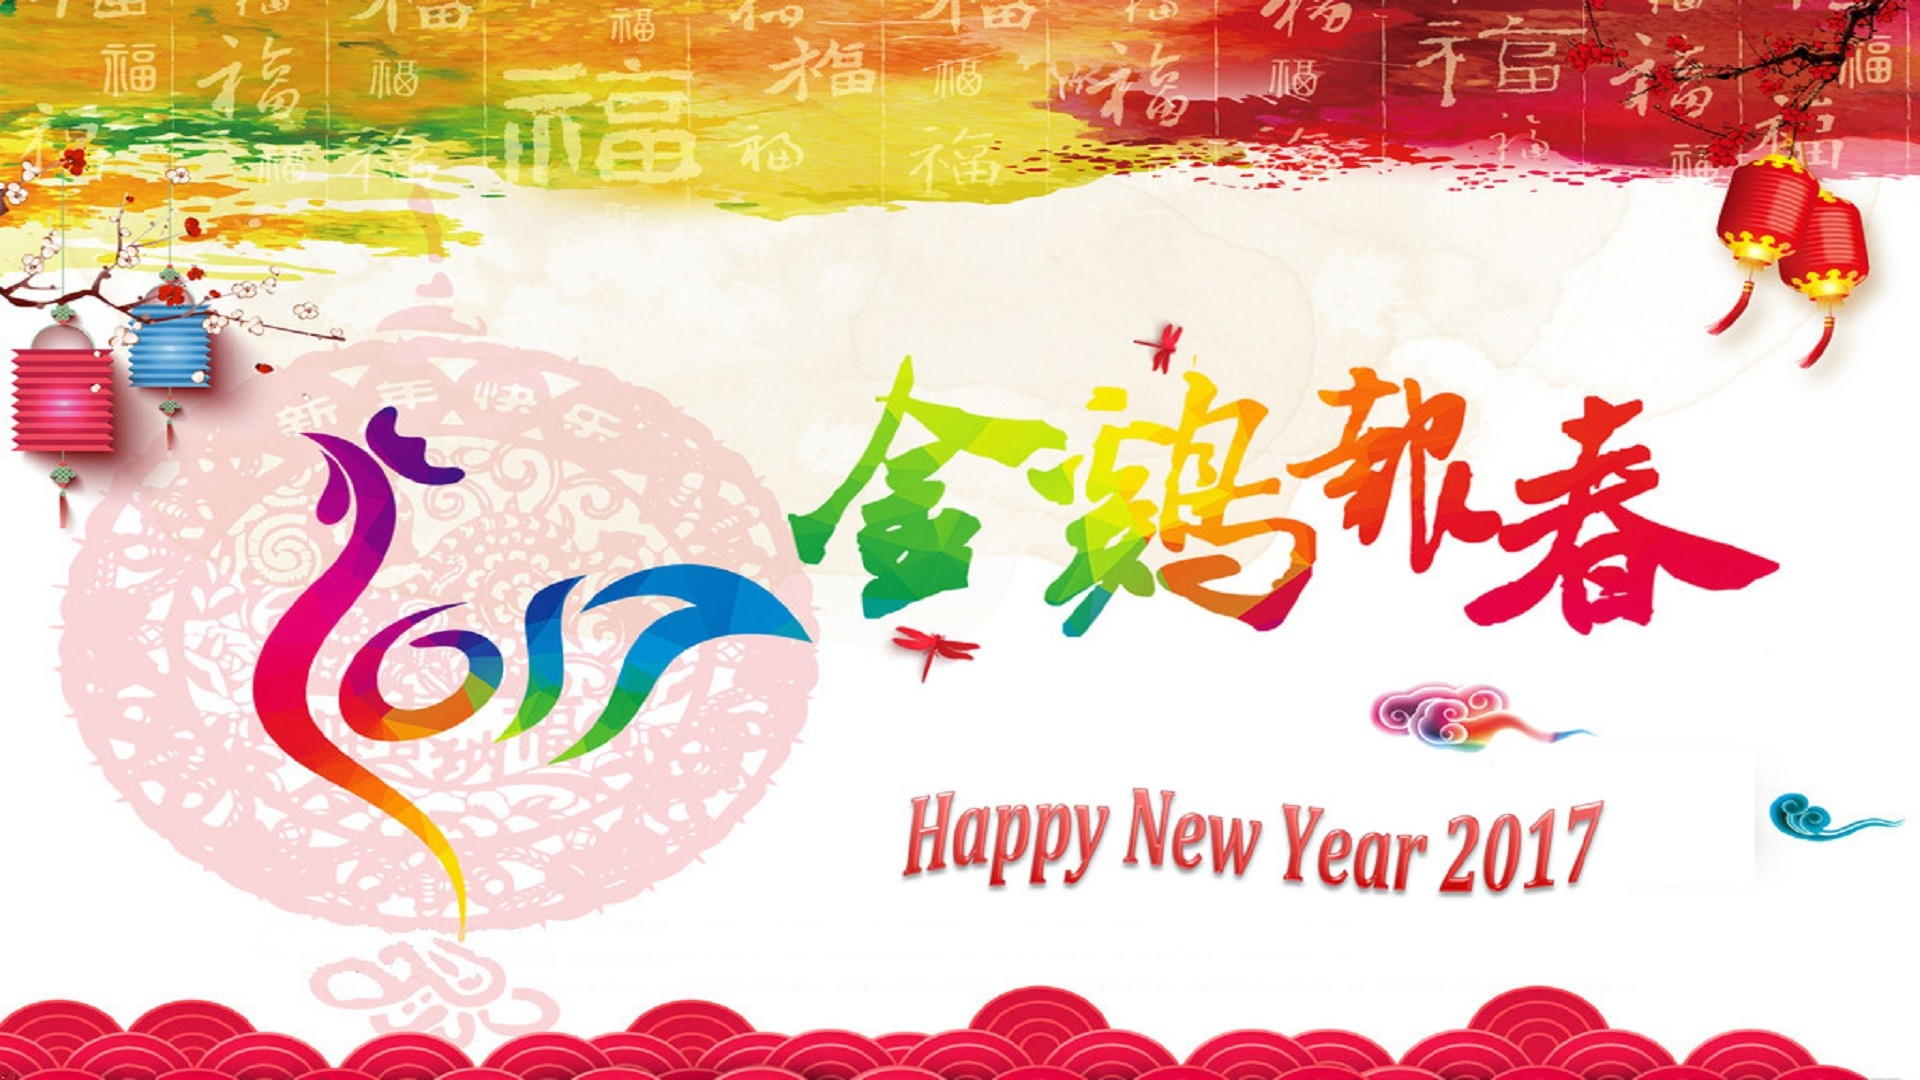 Chinese New Year 2017 Wallpaper